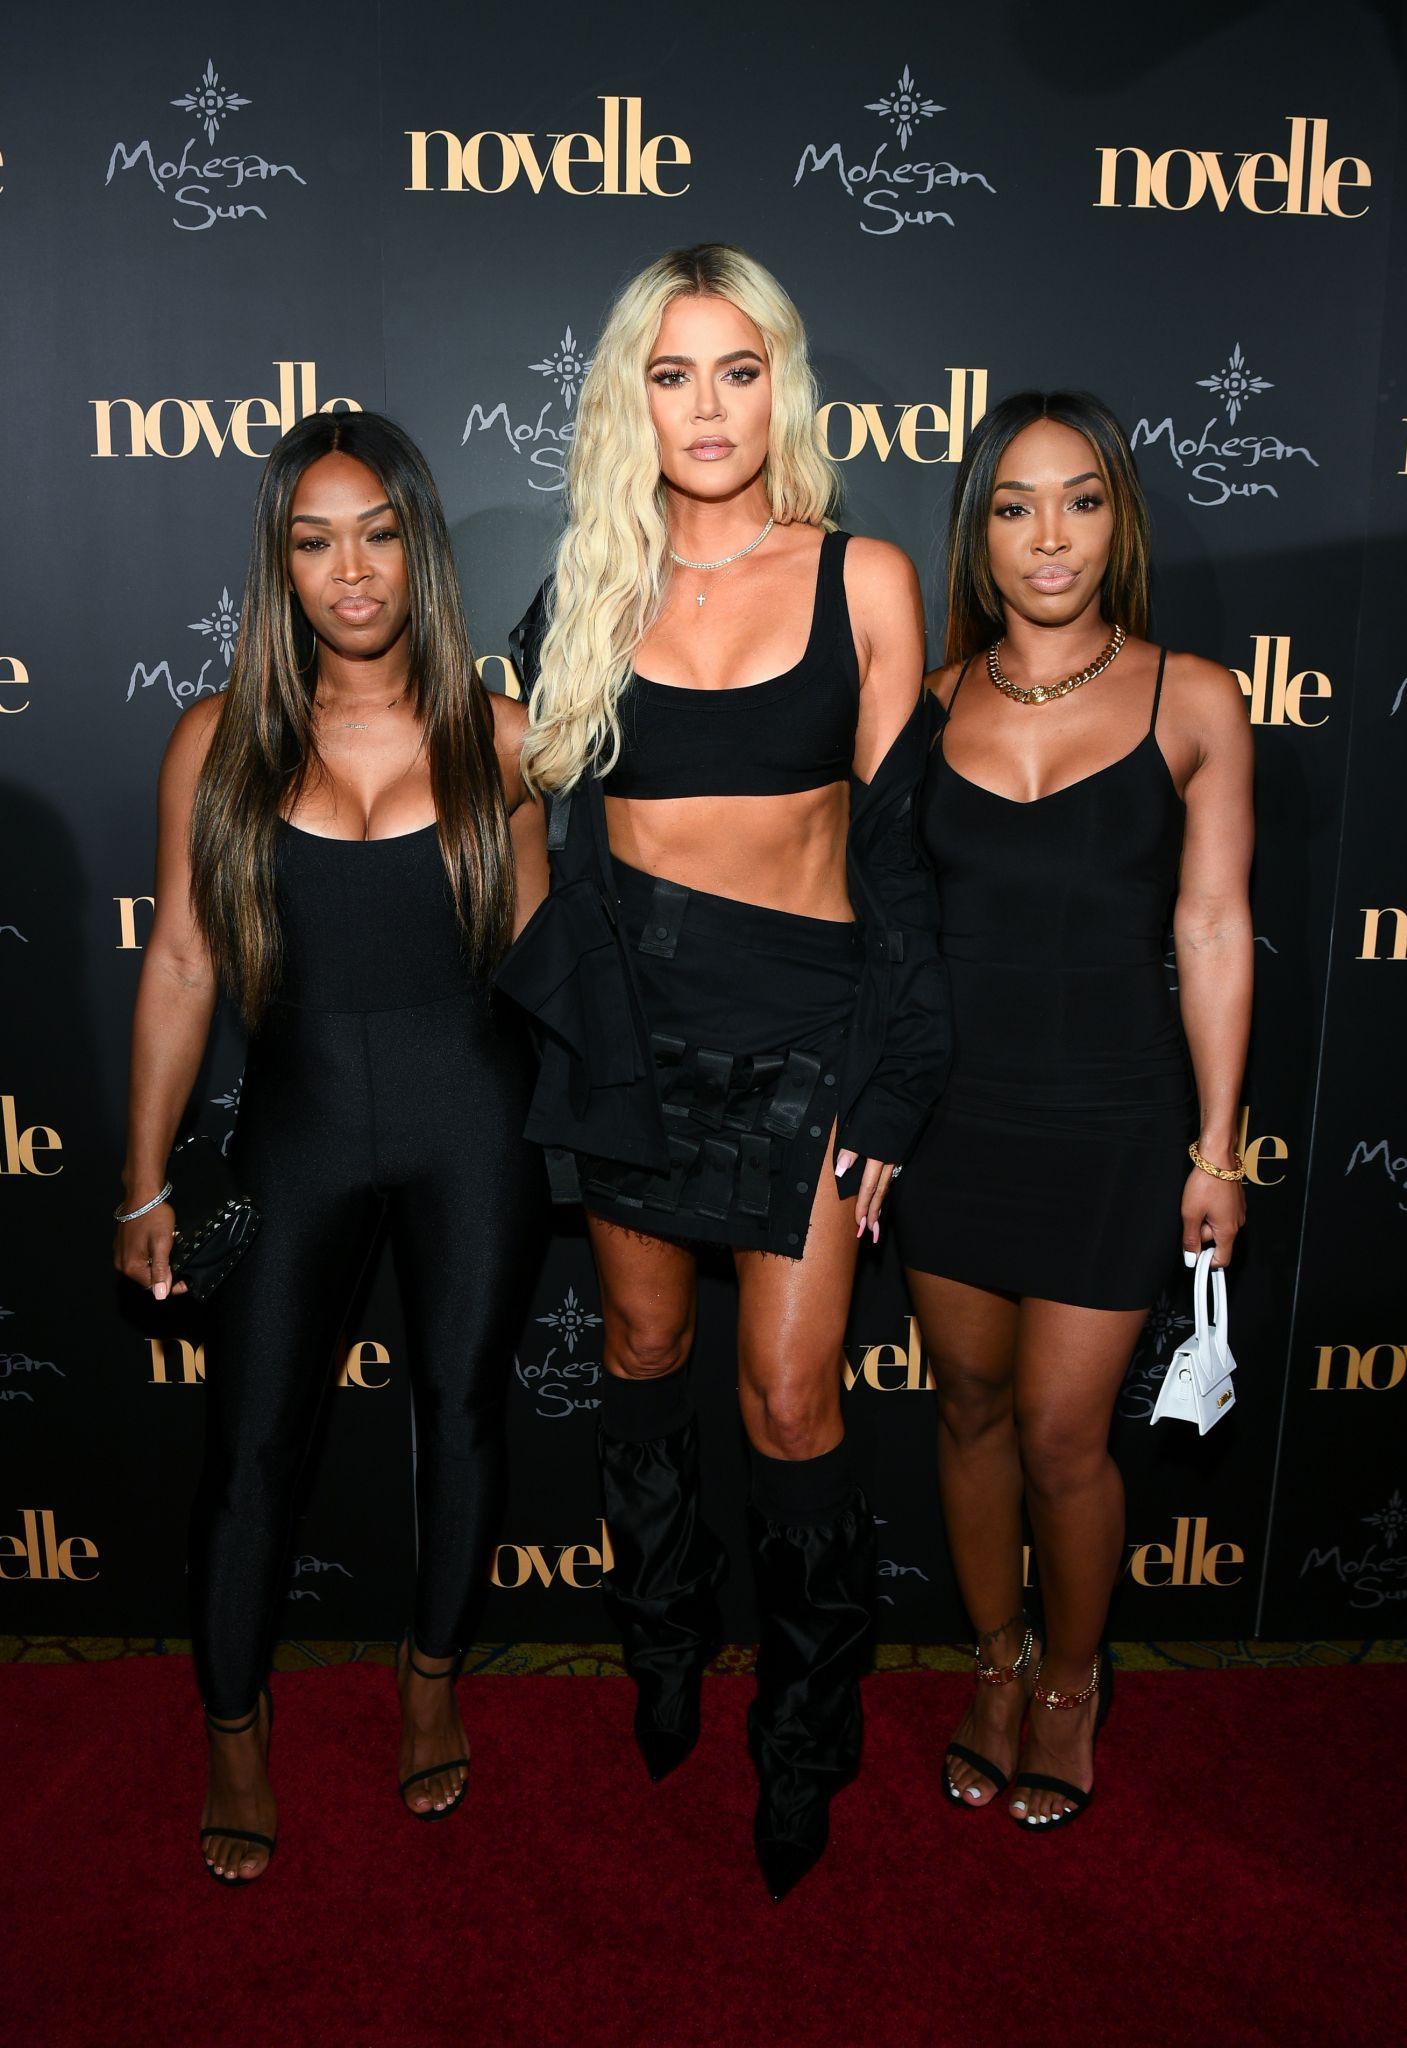 Khloe Kardashian parties at Mohegan Sun on 'Keeping Up with the Kardashians'